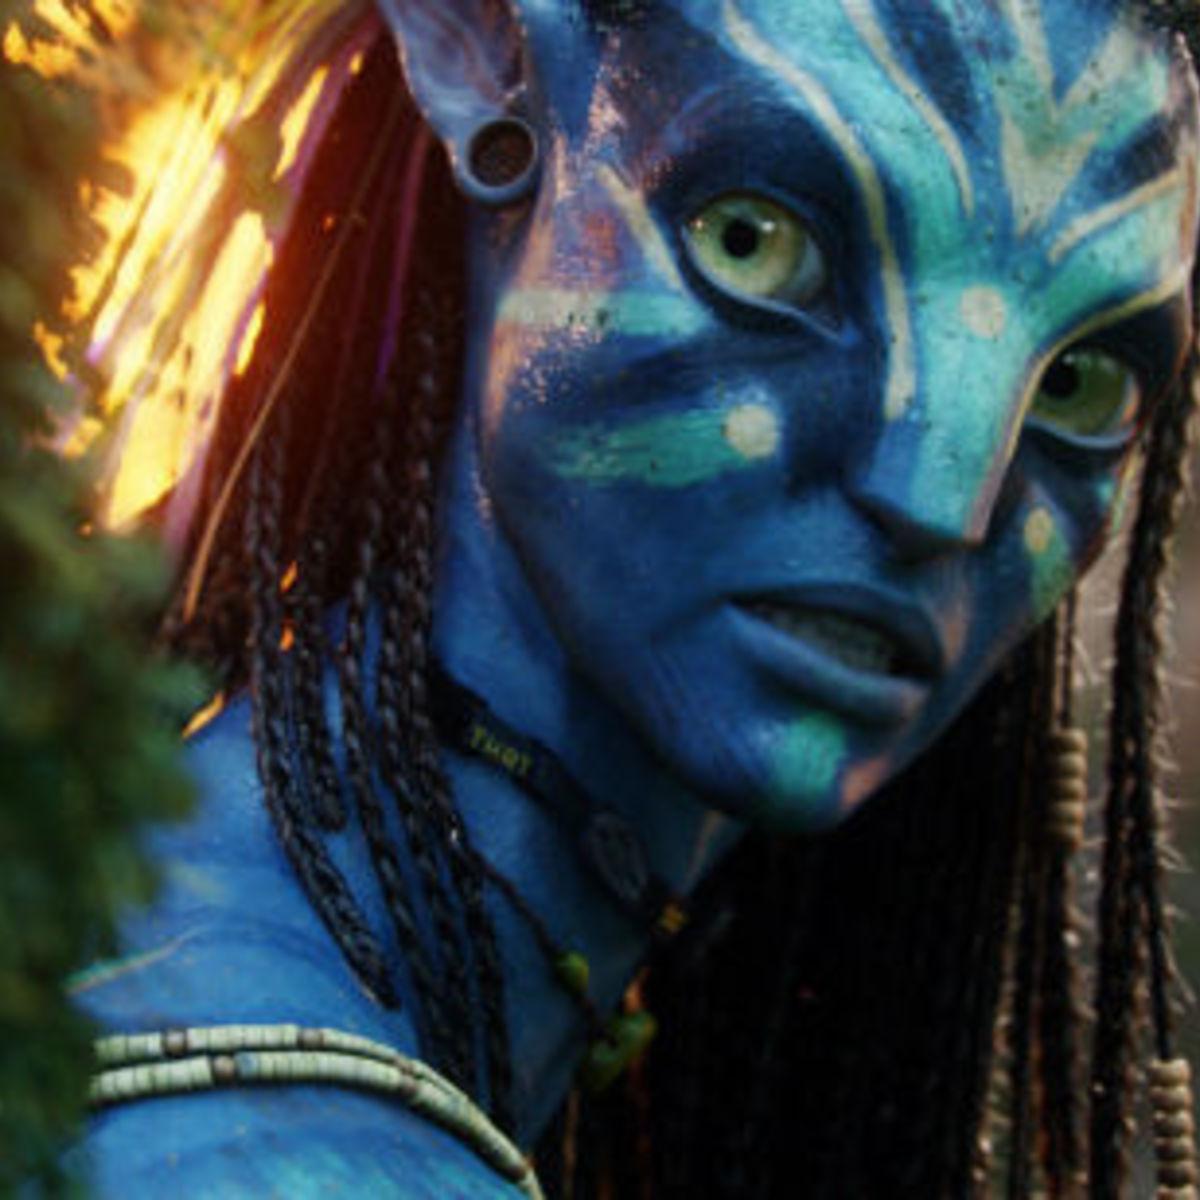 Avatar_neytiri_saldana_facepaint_3.jpg